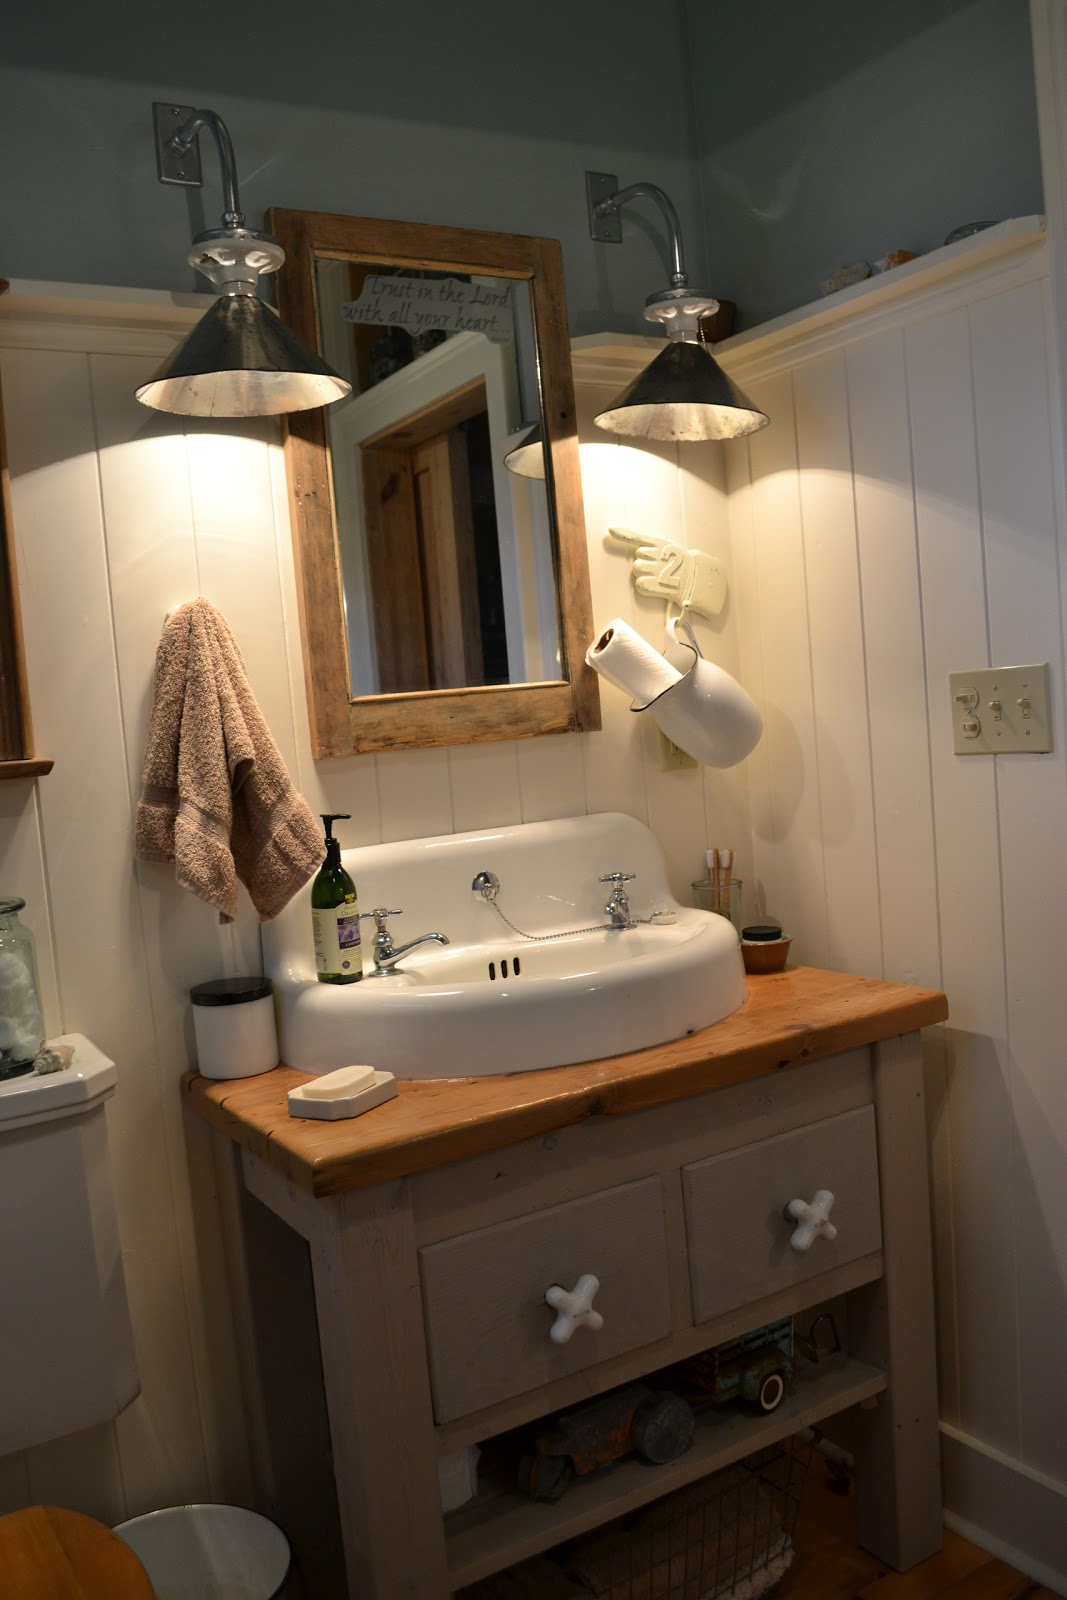 The 1829 Farmhouse: Farmhouse Tour: Bathroom